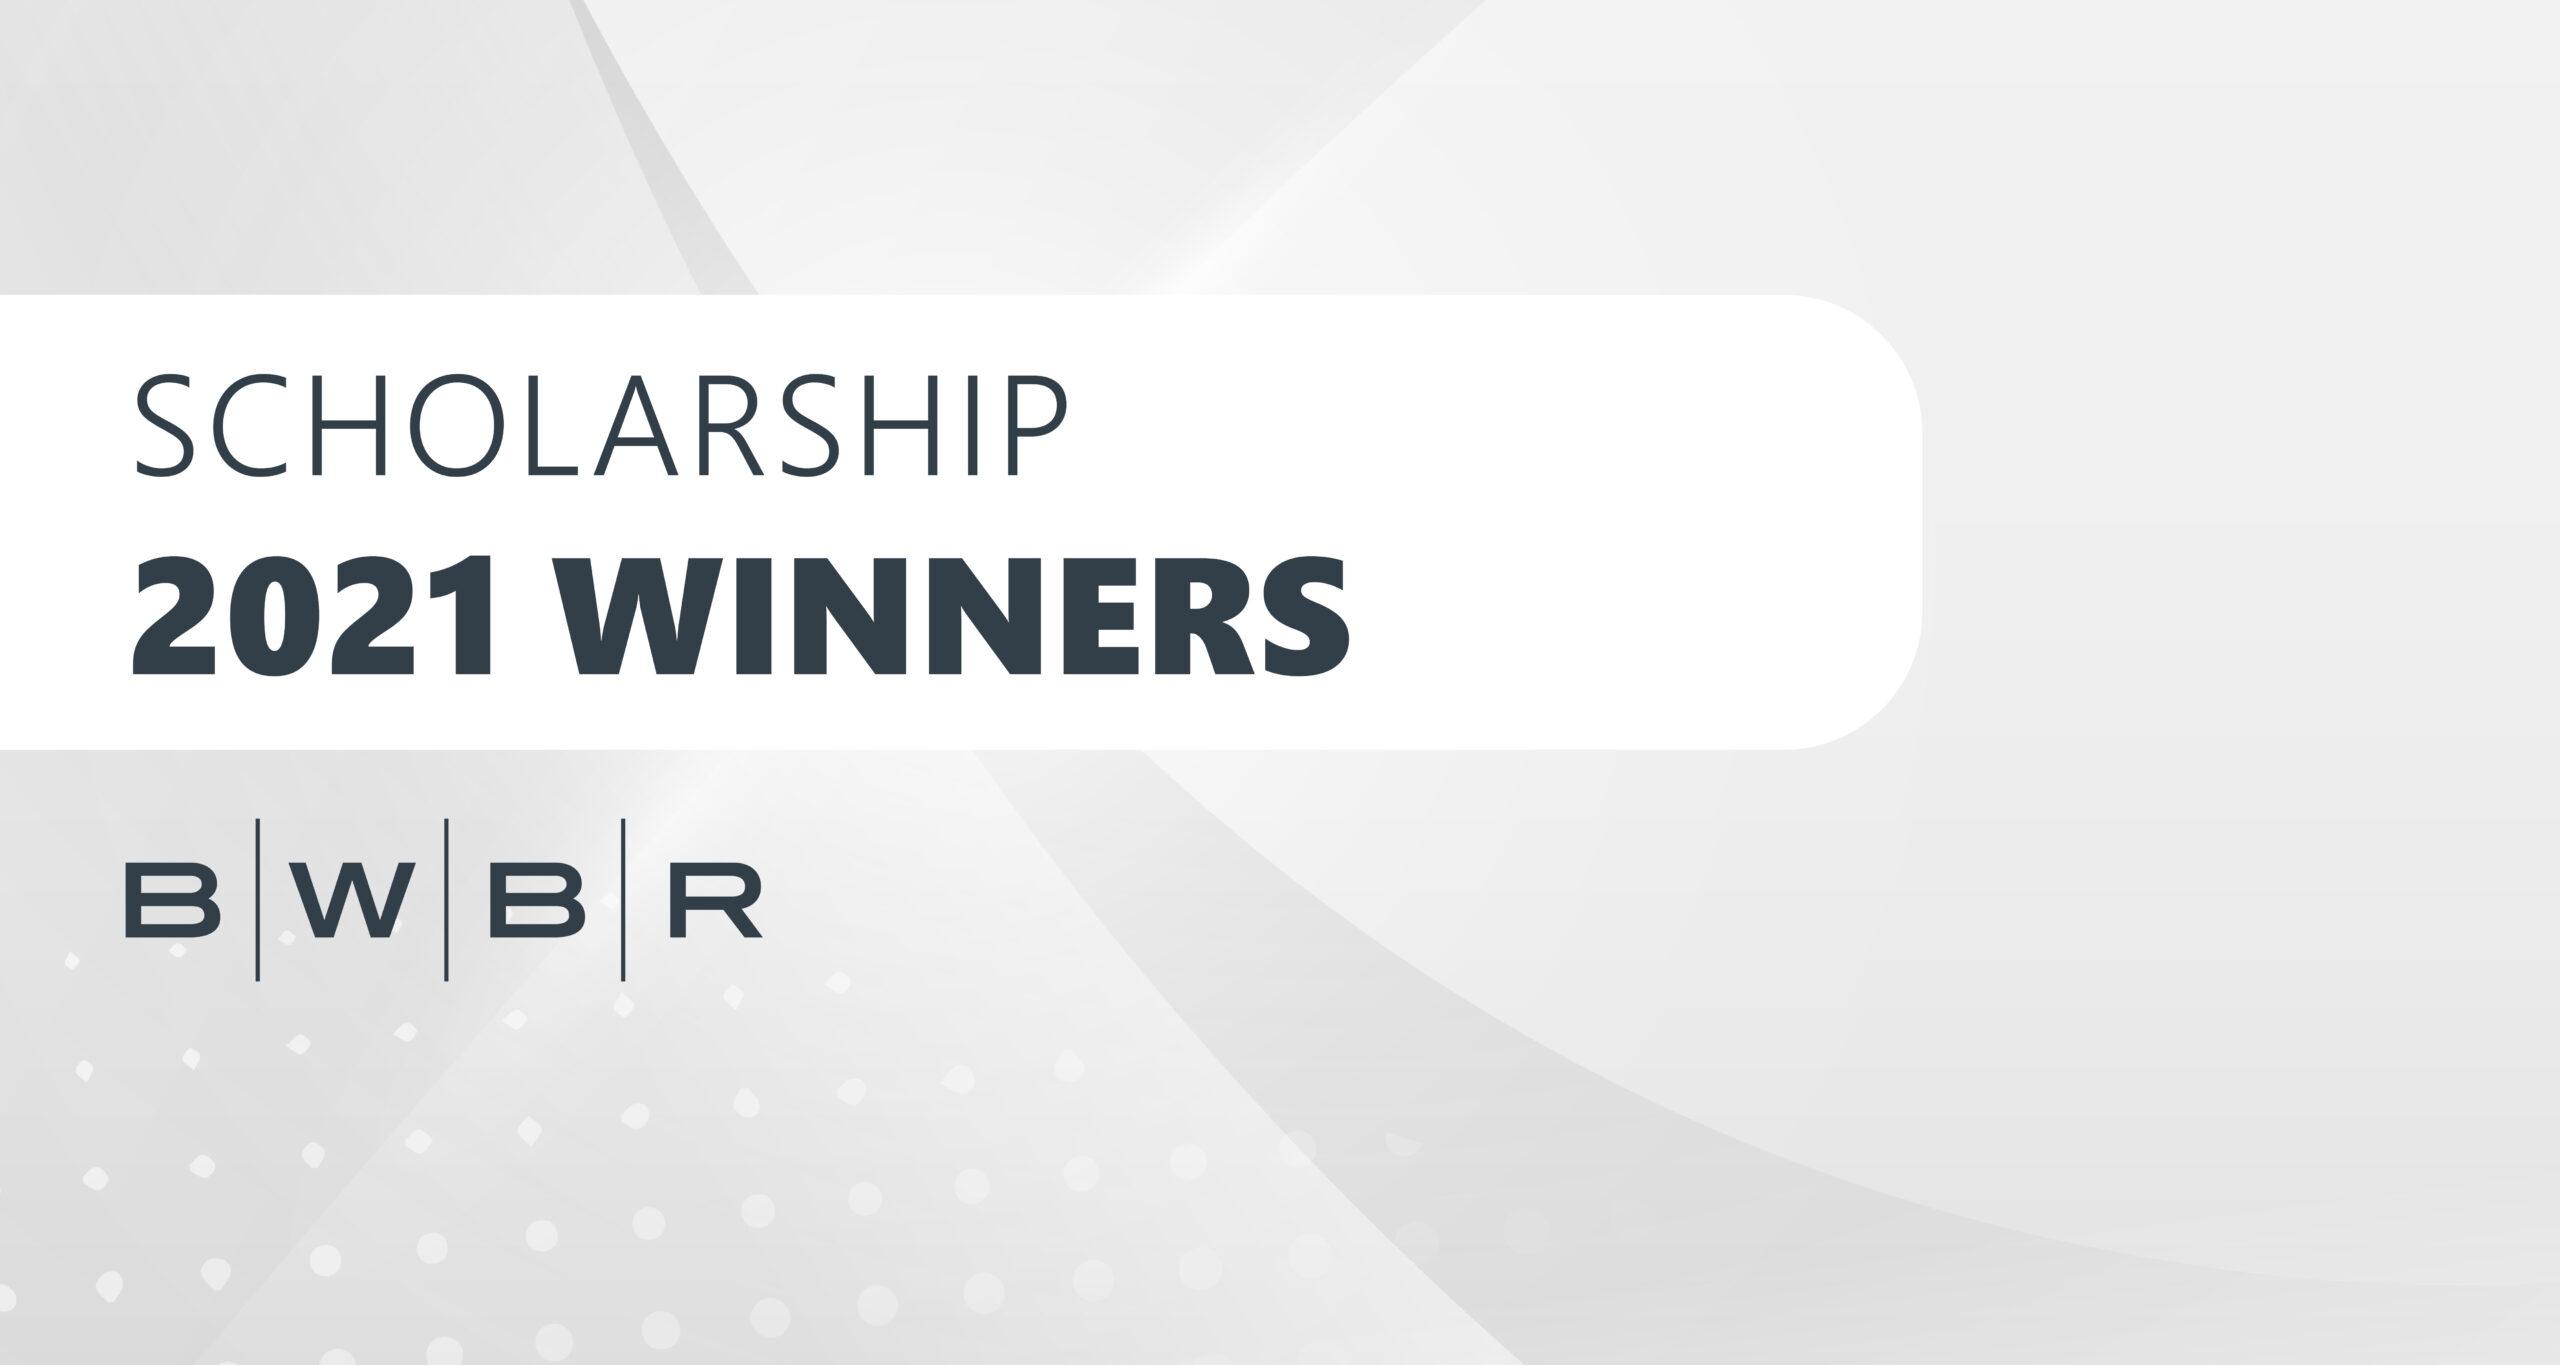 2021 BWBR Scholarship Blog Feature Image